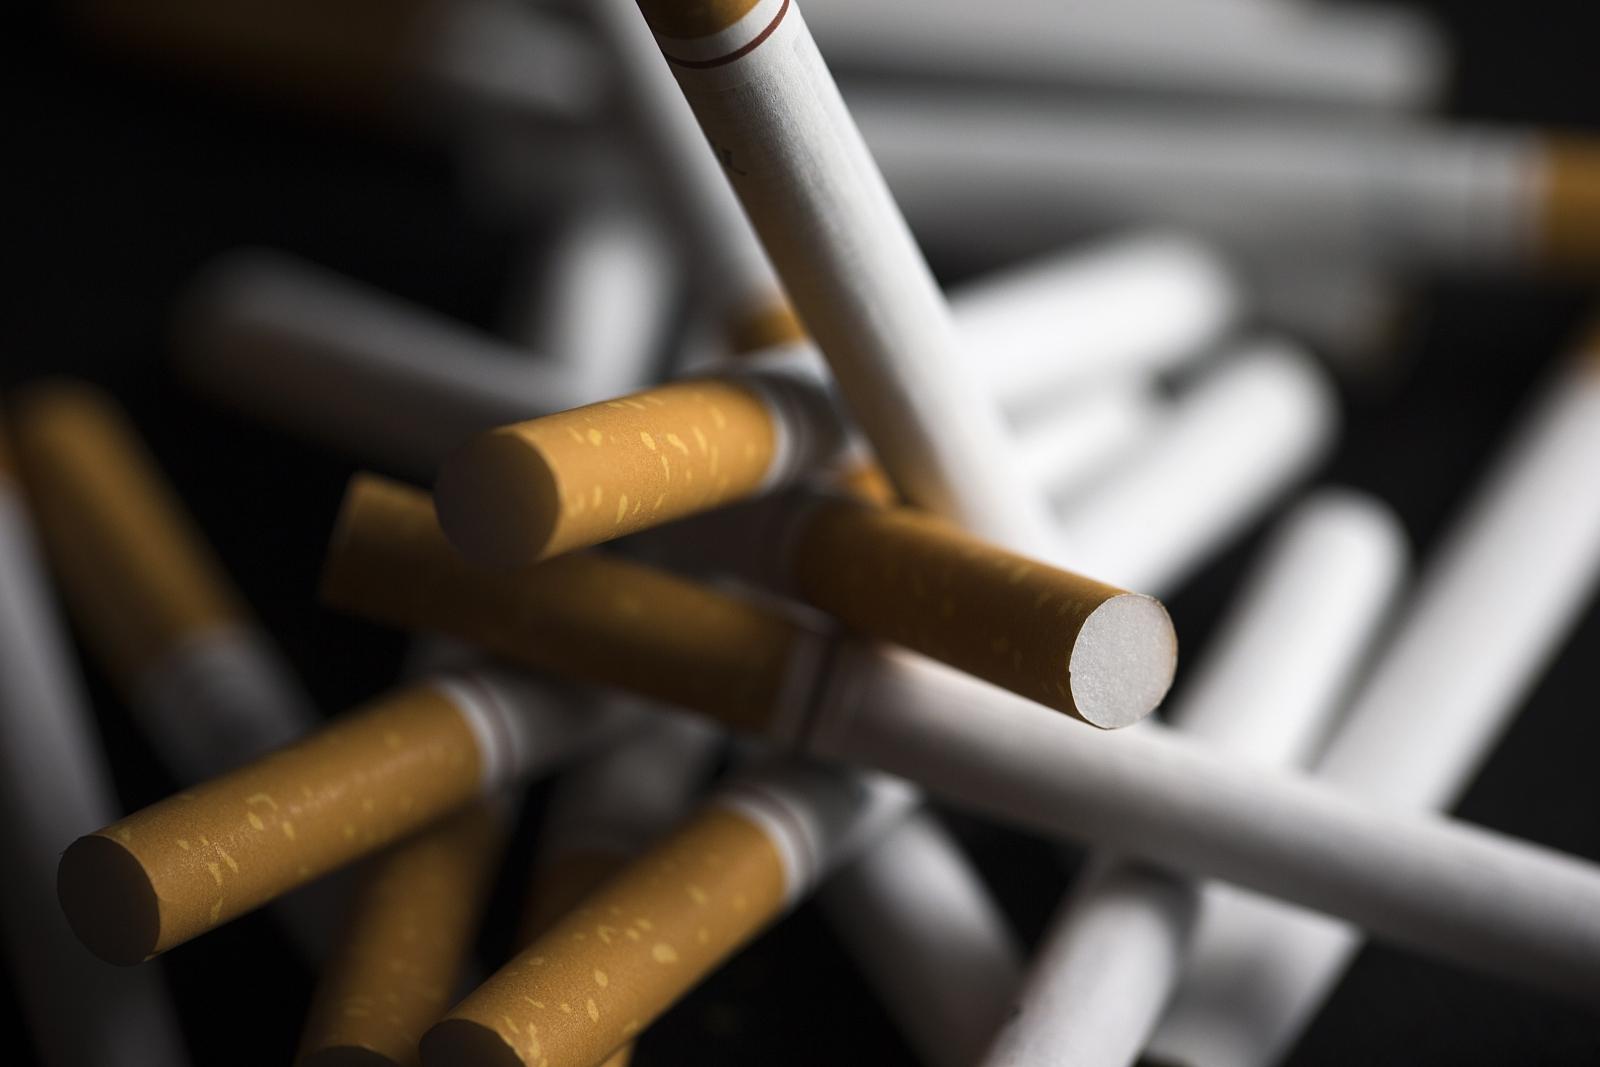 nc smoking ban law